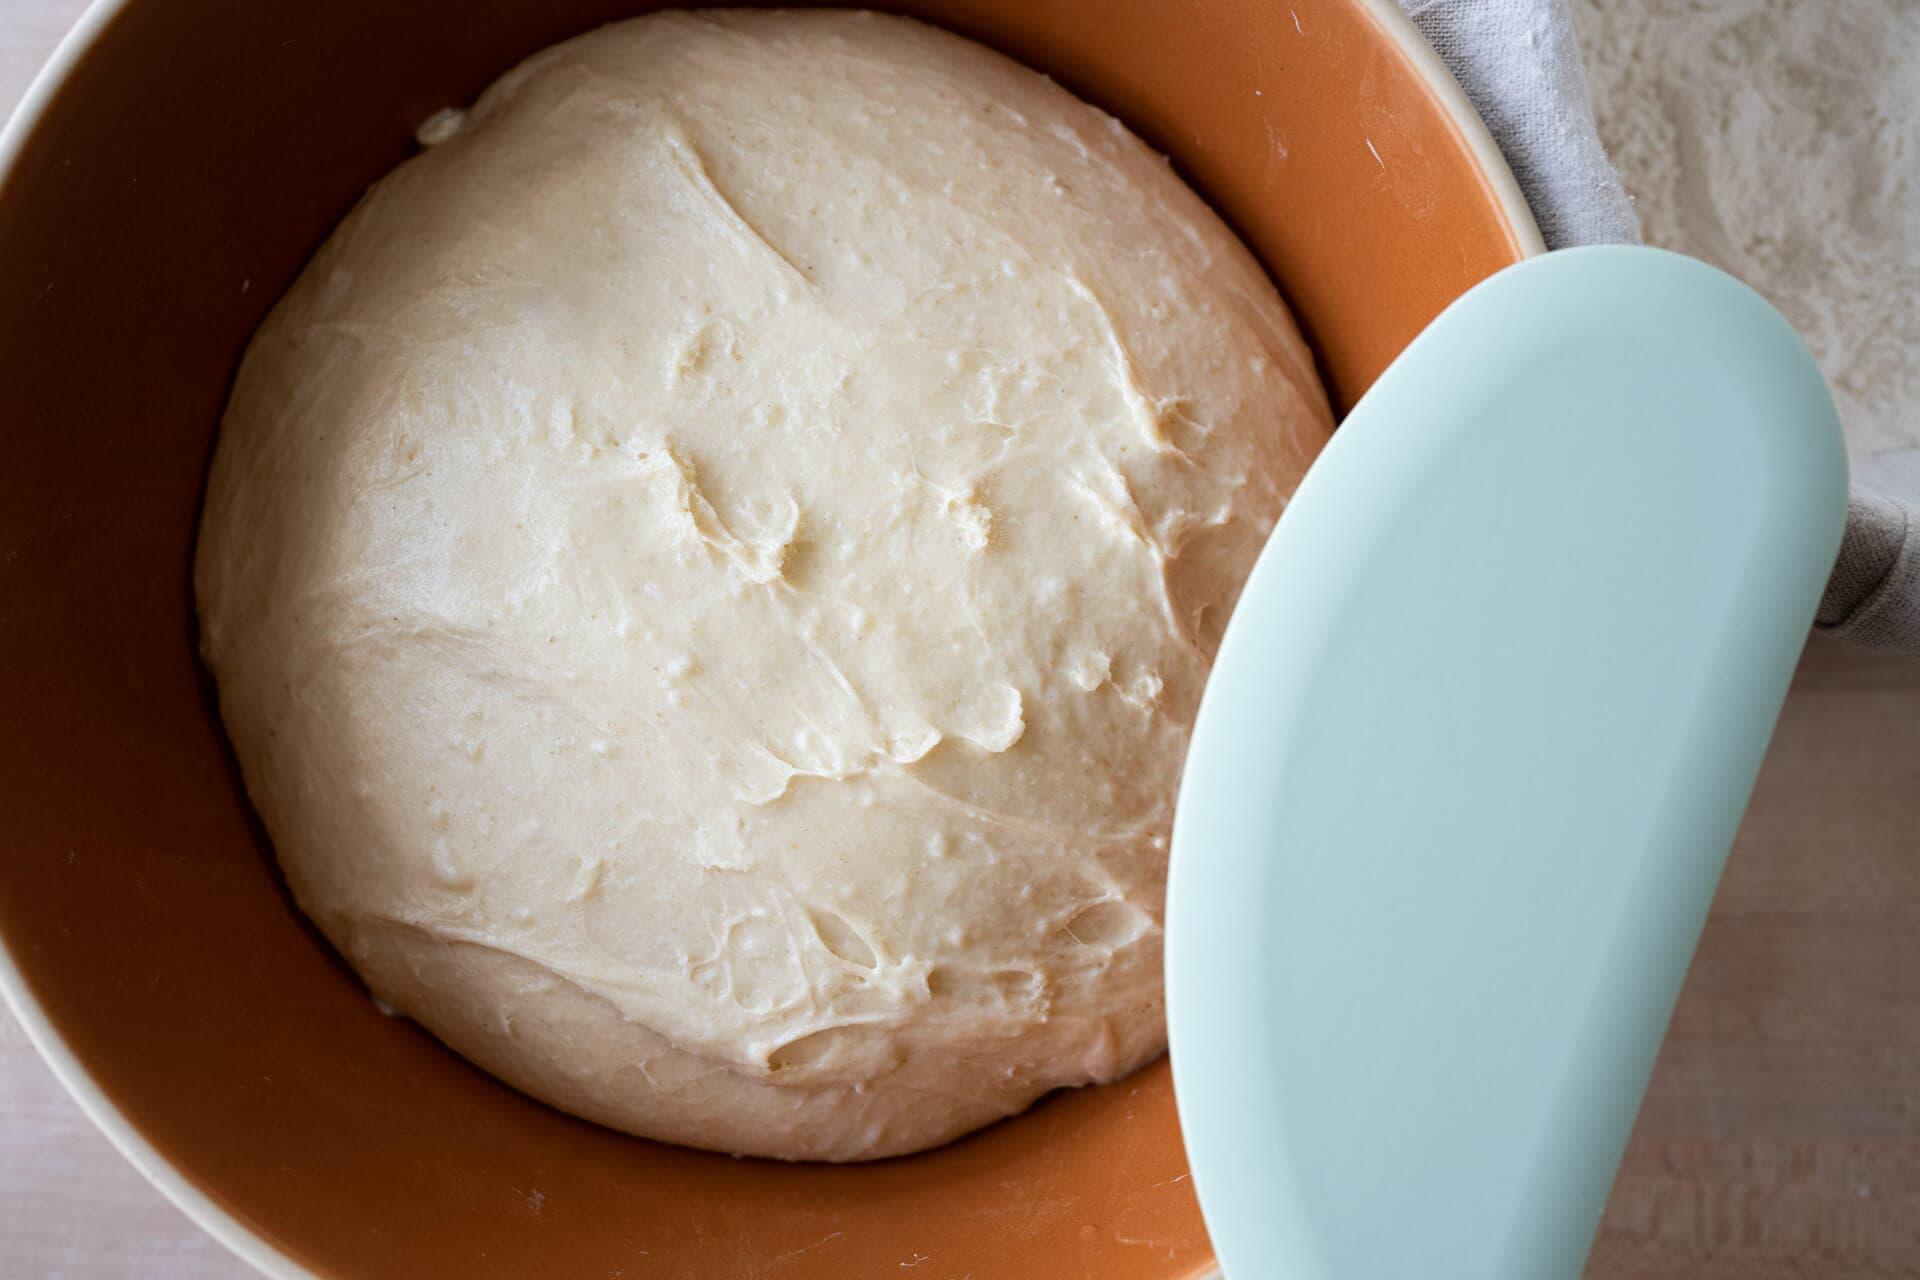 Fully proofed soft sourdough potato bun dough